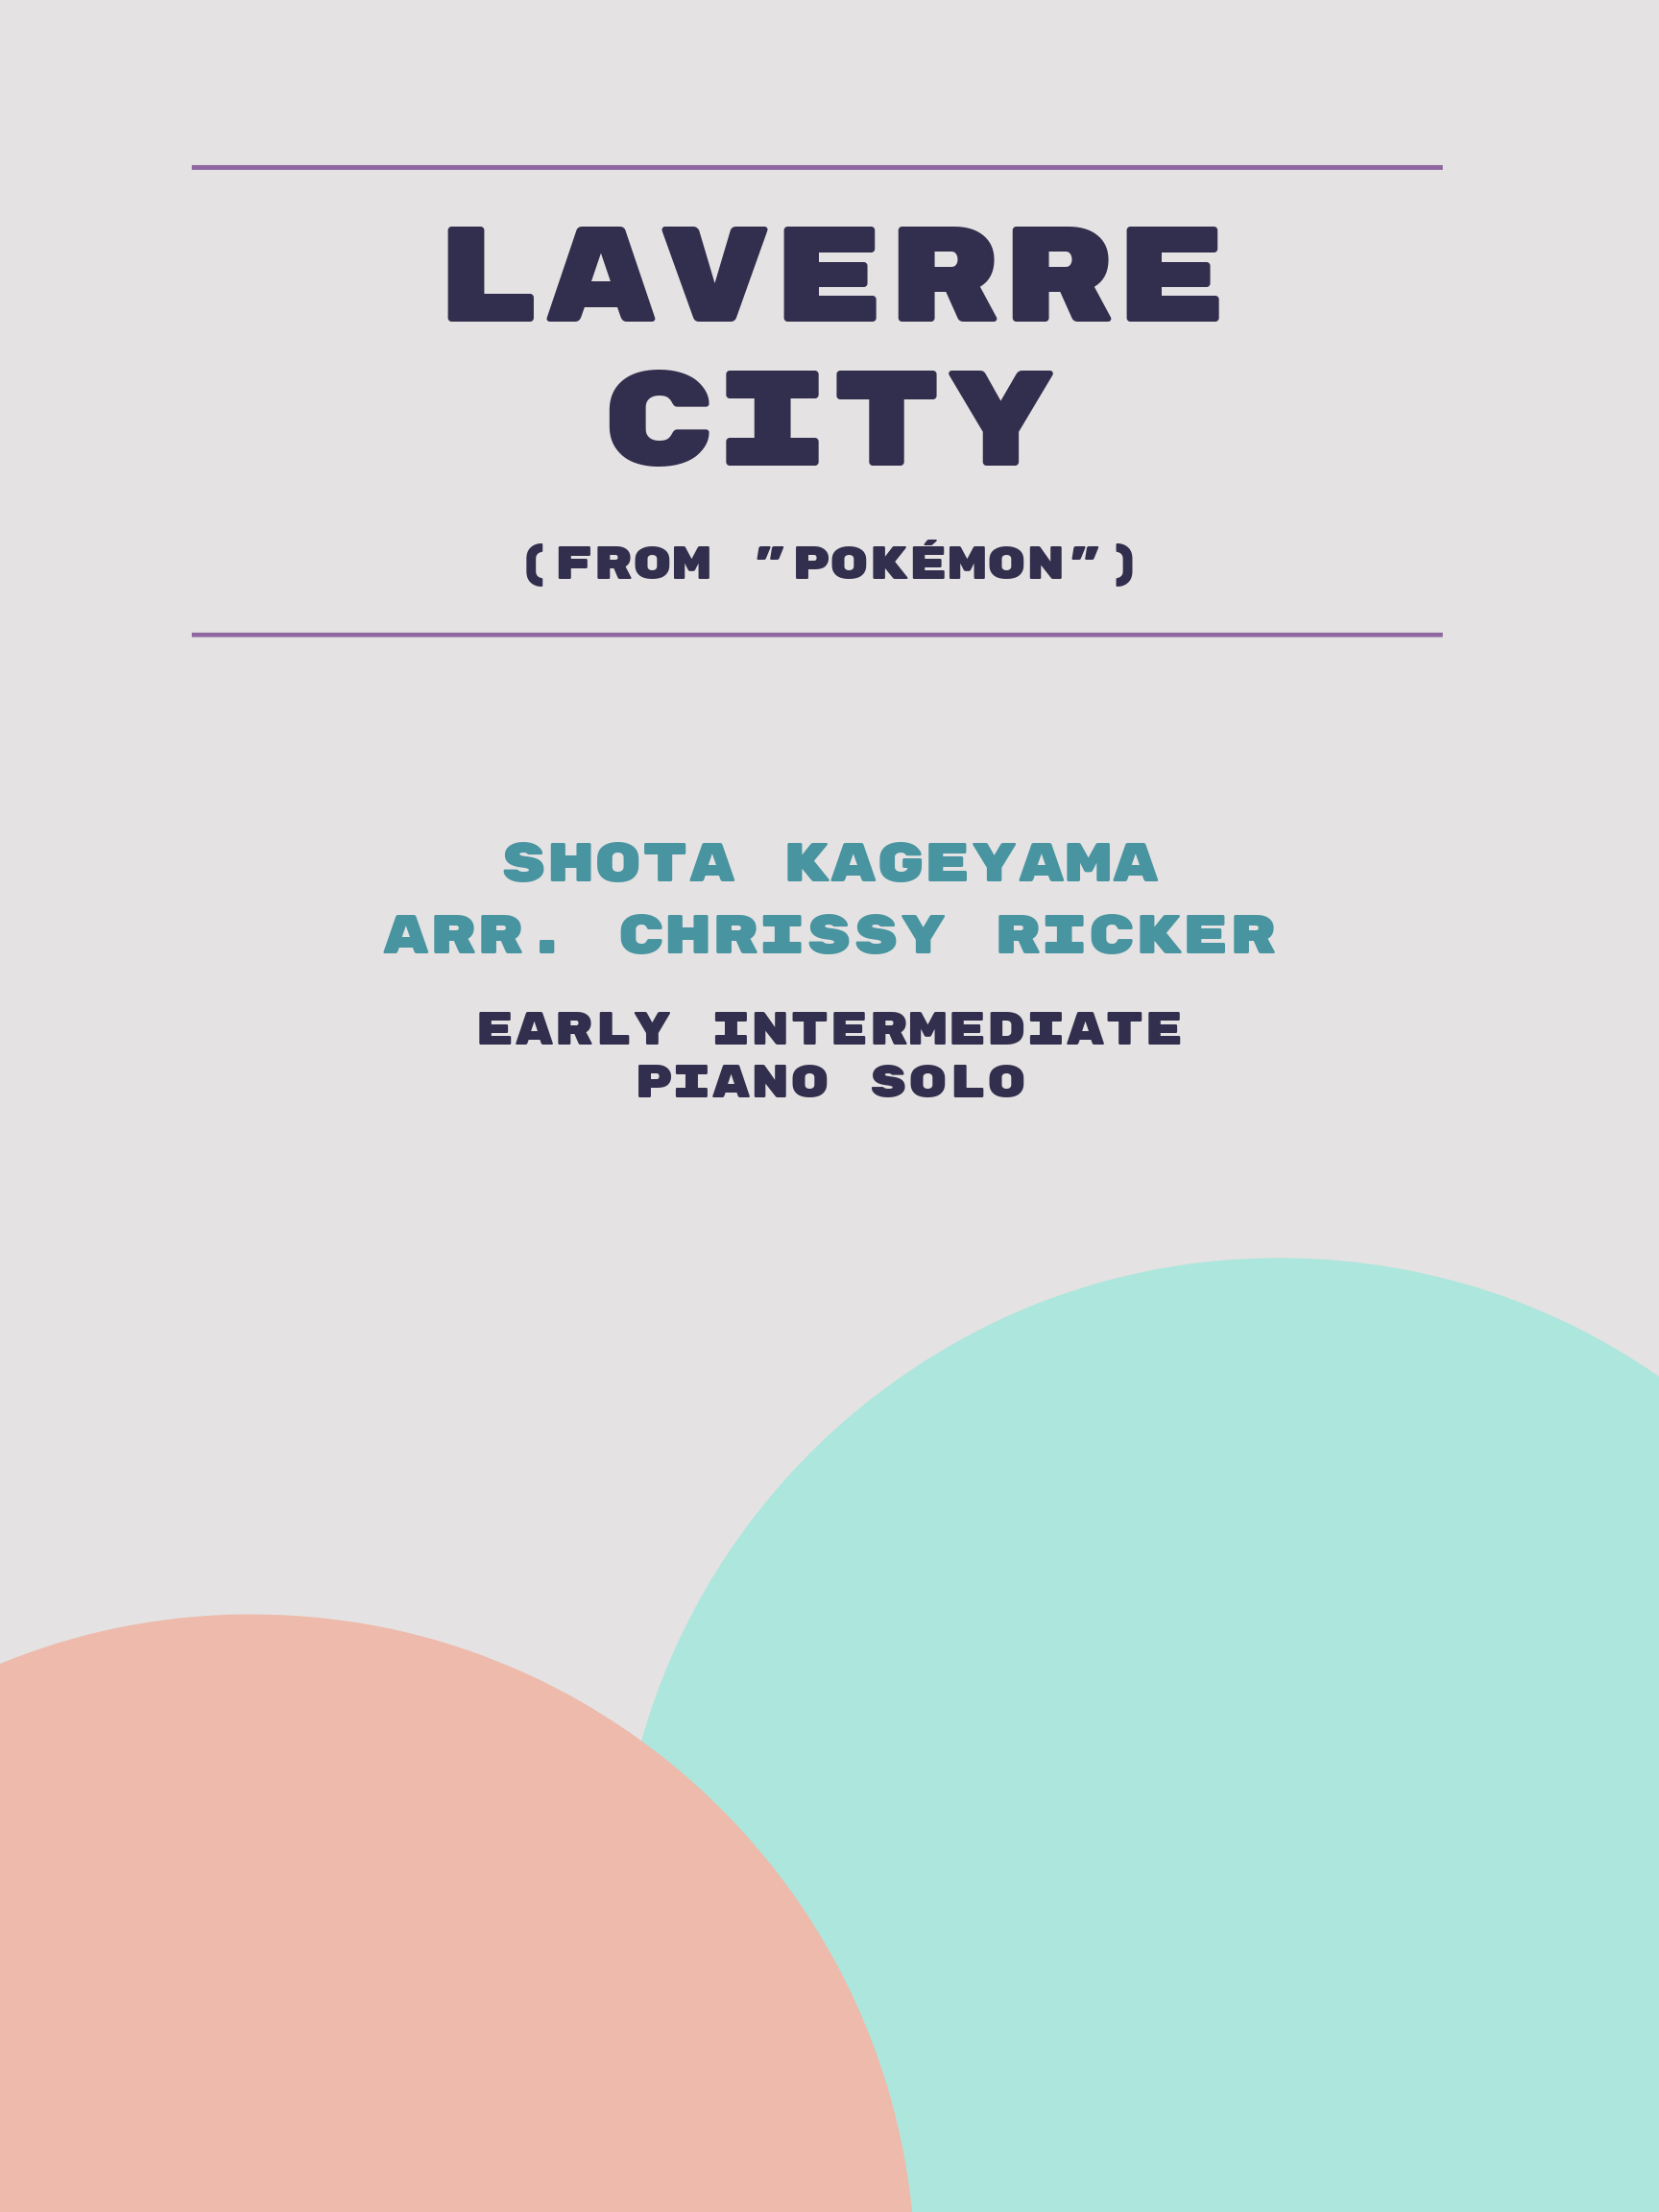 Laverre City by Shota Kageyama